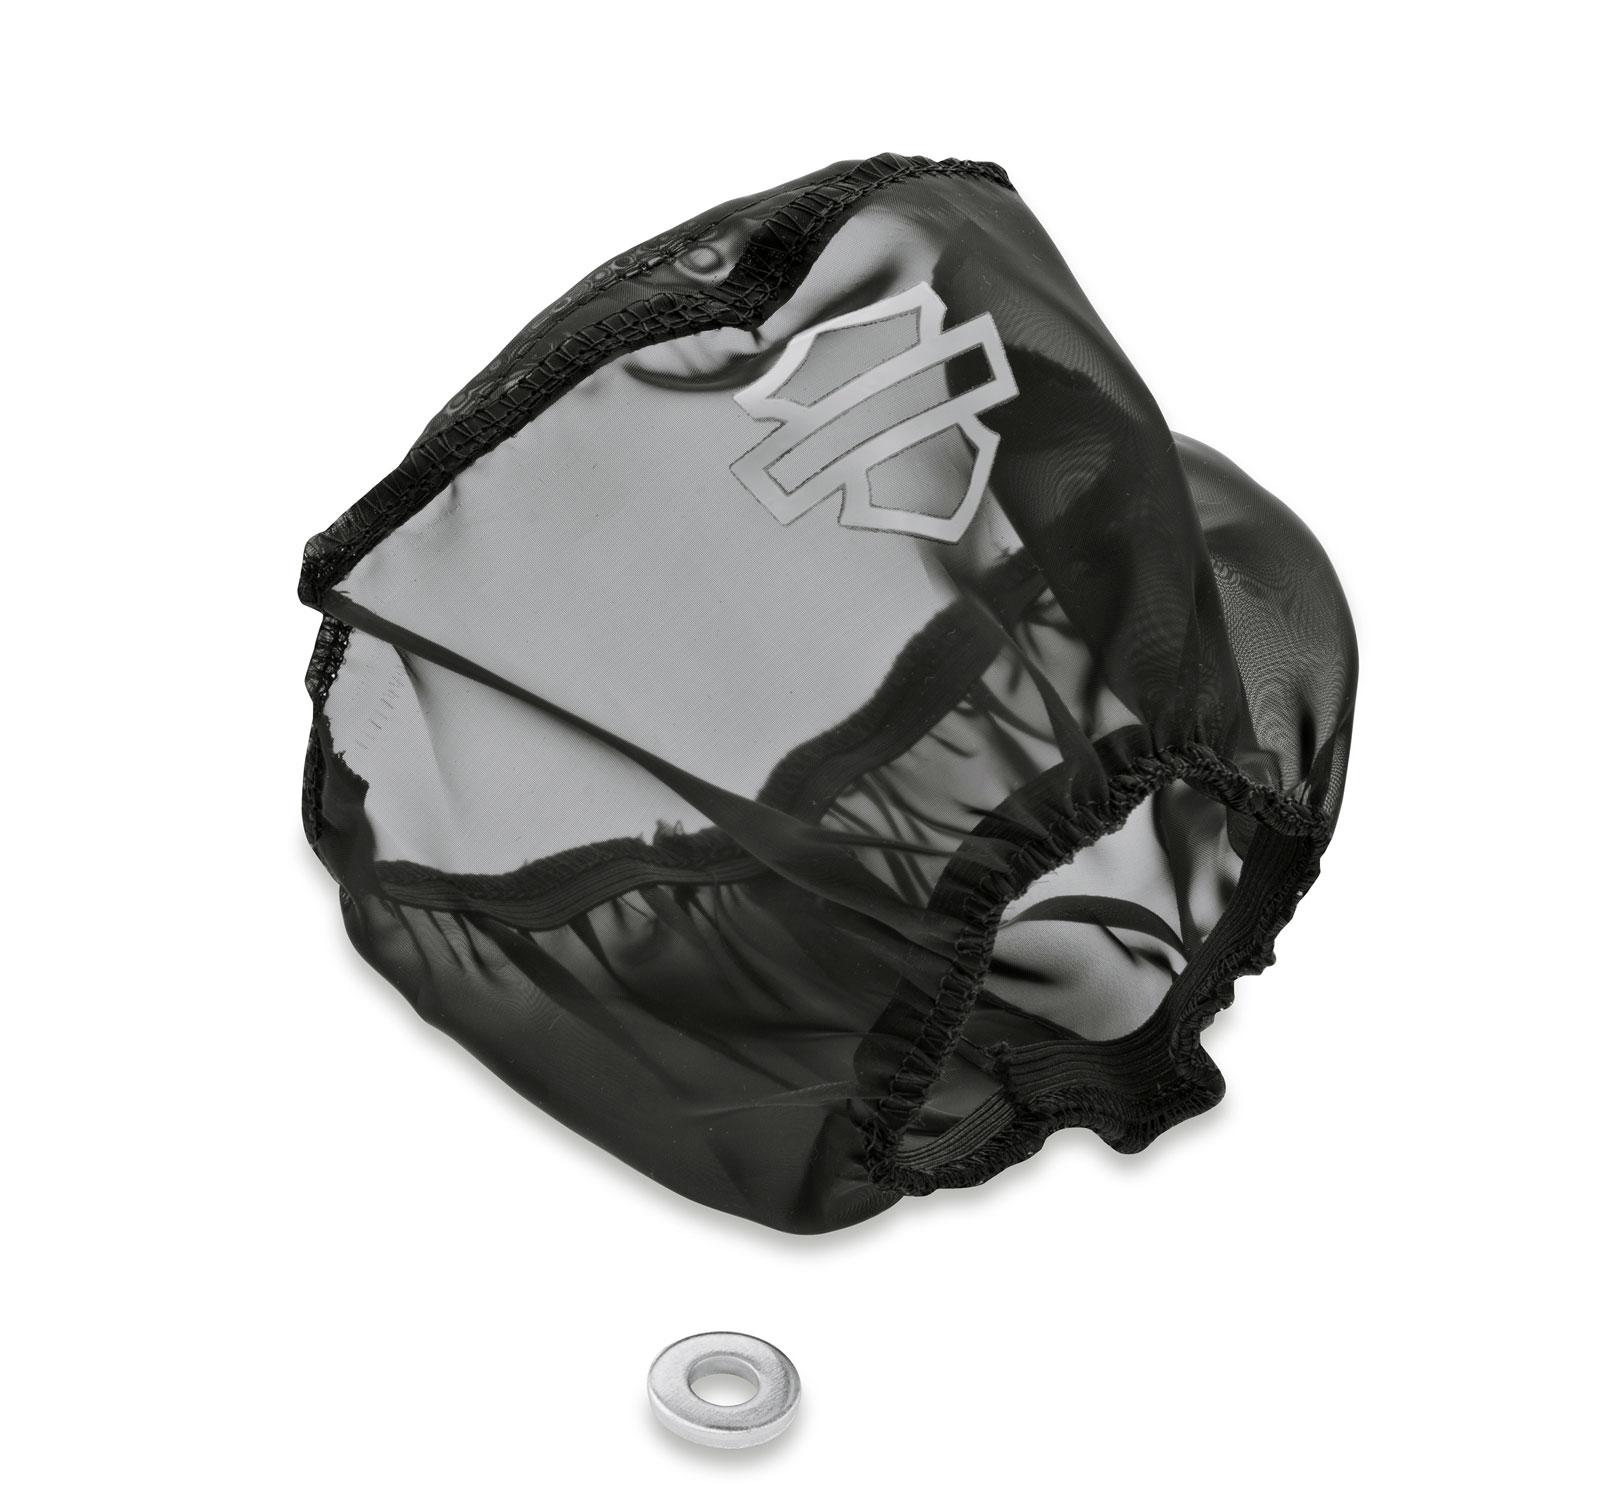 Harley Davidson Screamin Eagle Twin Cam Und Evolution Stage Kits Timing Belt Luftfilter Regenschutz